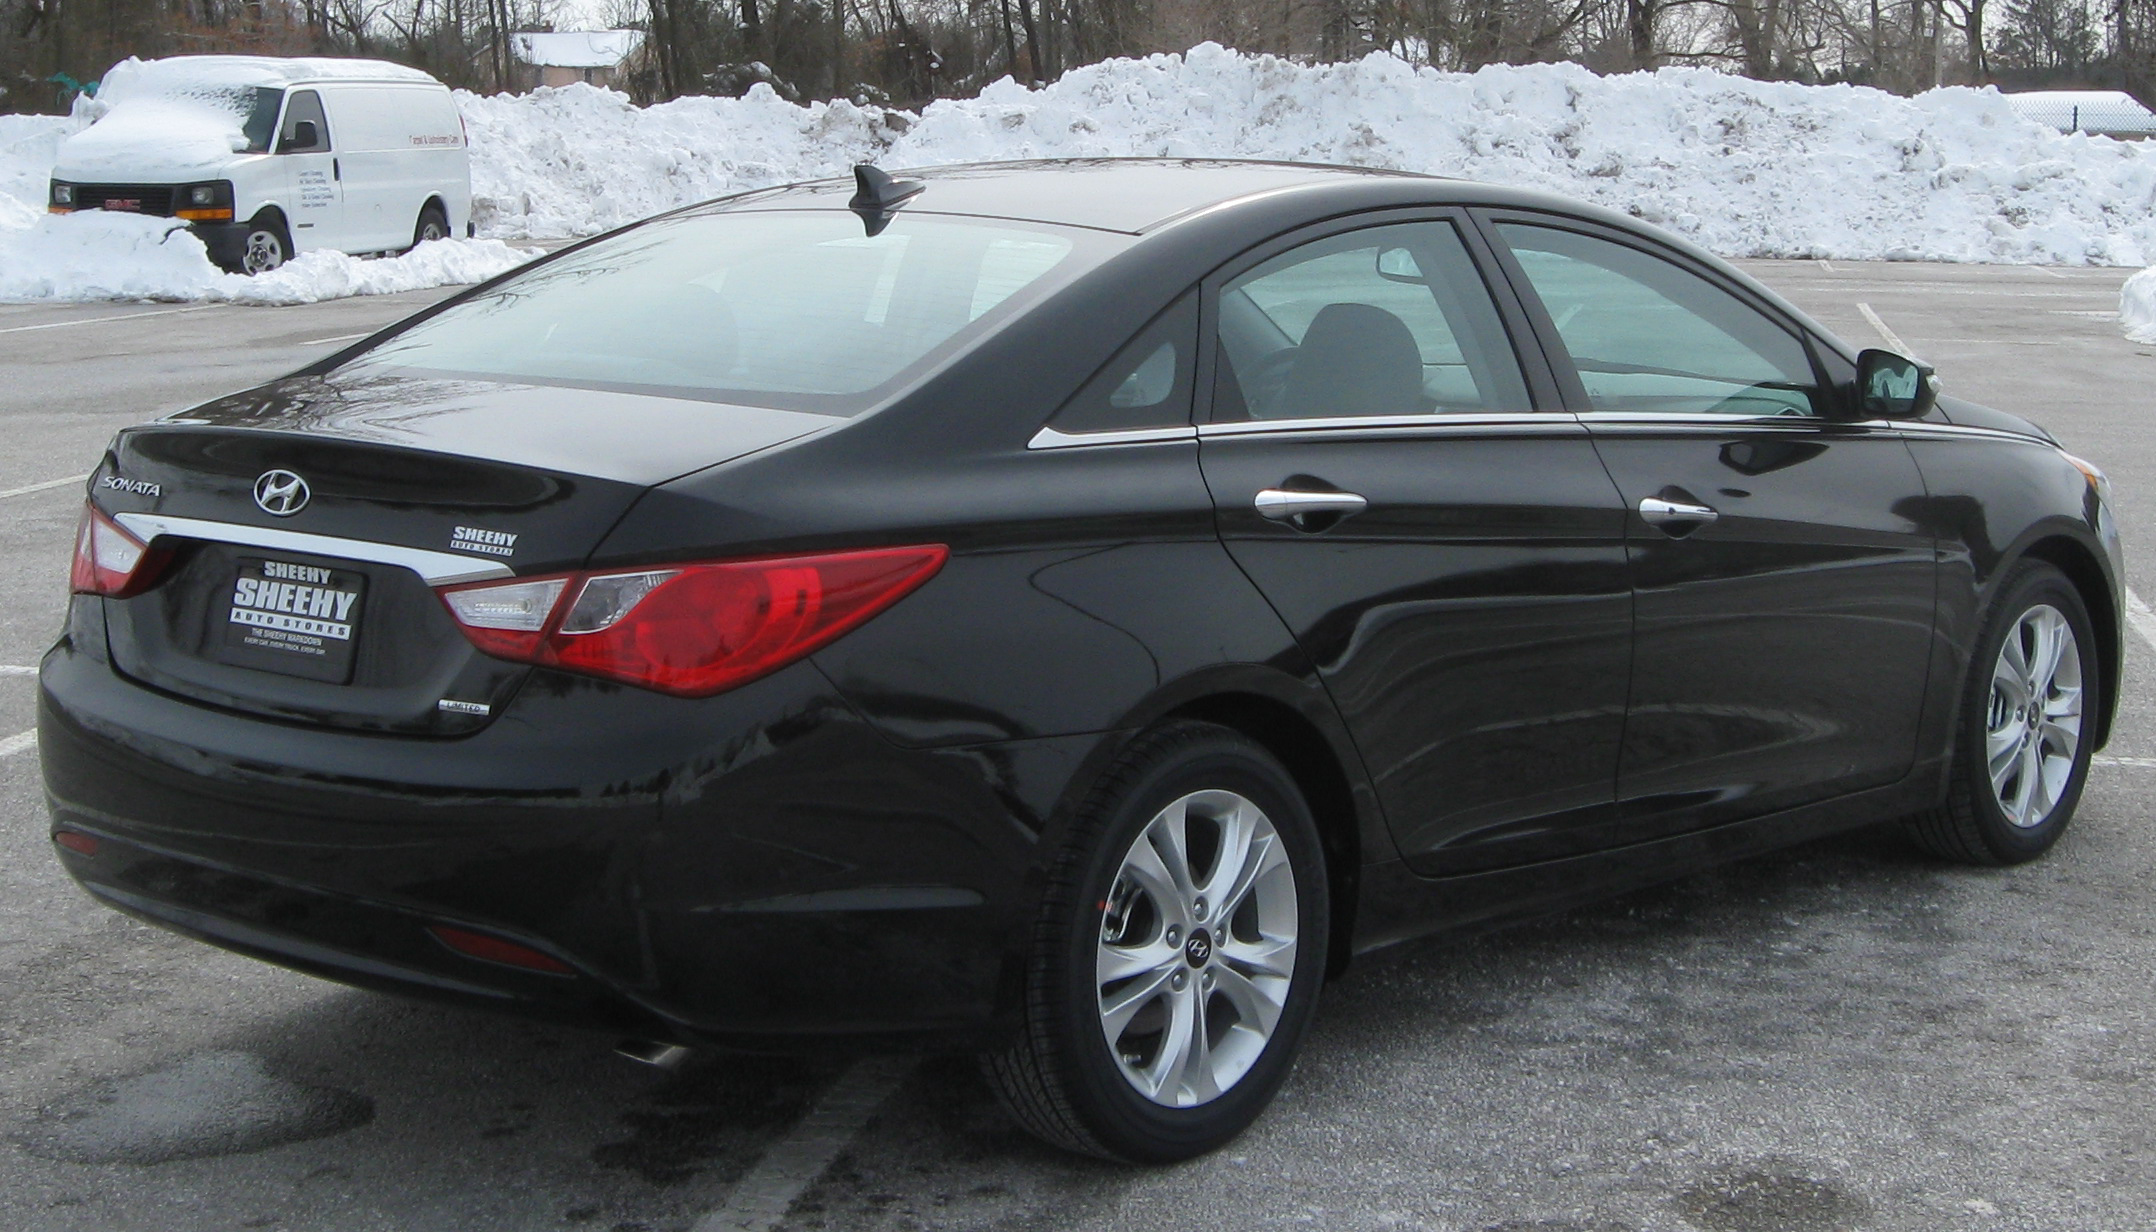 2011 Hyundai Sonata - Information and photos - ZombieDrive